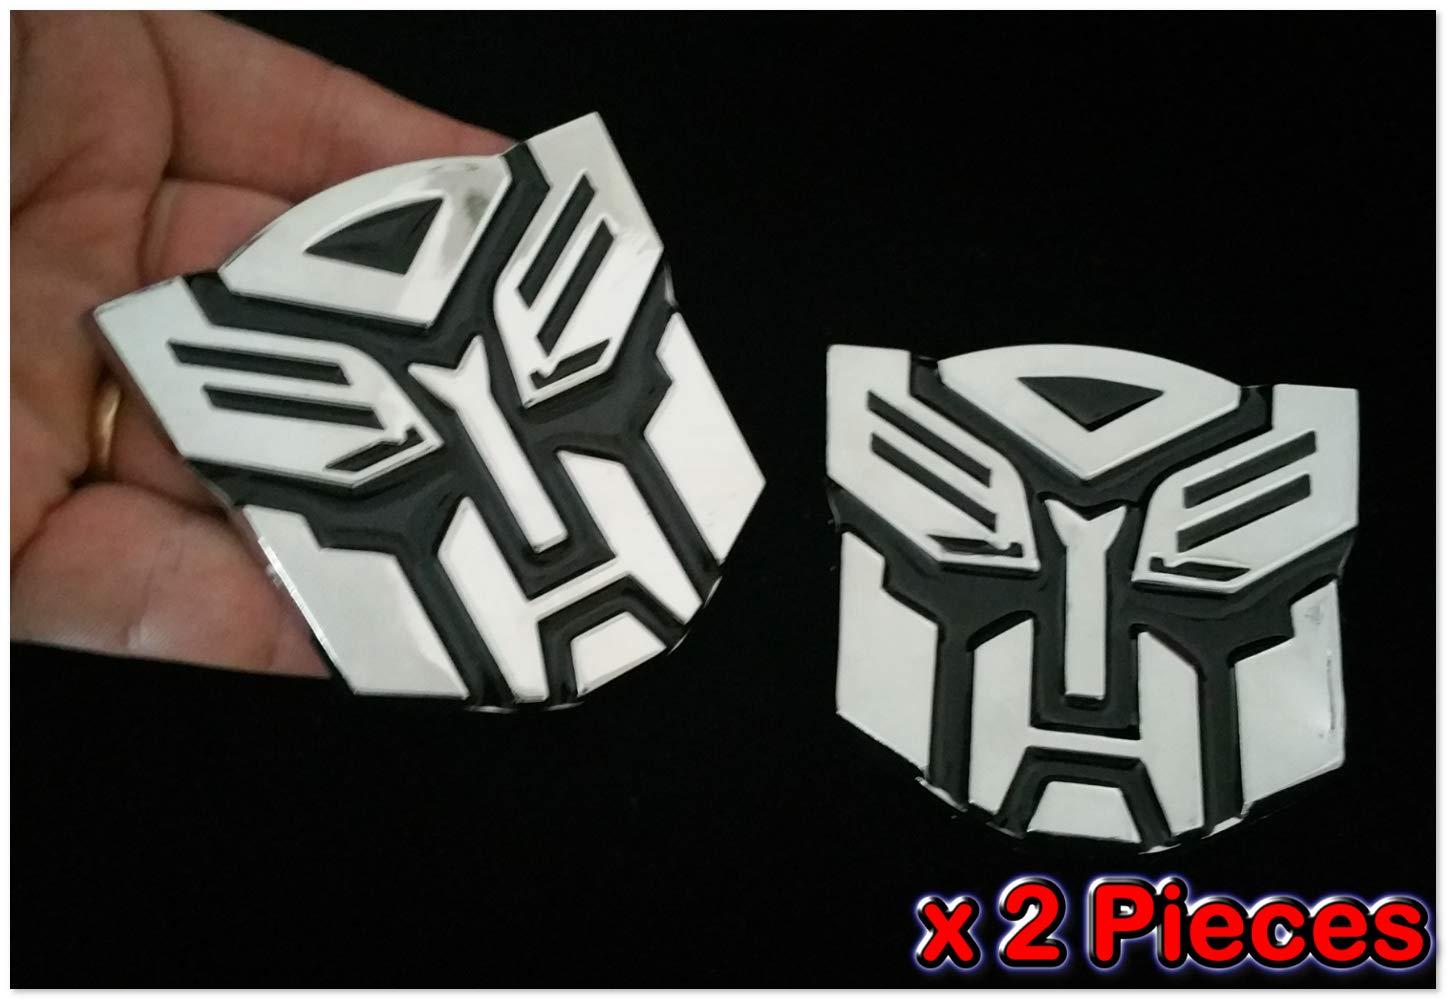 SKU# 5262#87 2 Pcs Transformer Autobot Emblem Chrome Metal Badge Trunk Auto Fender Side Door Car Adhesive 3D Die Cast Zinc Alloy